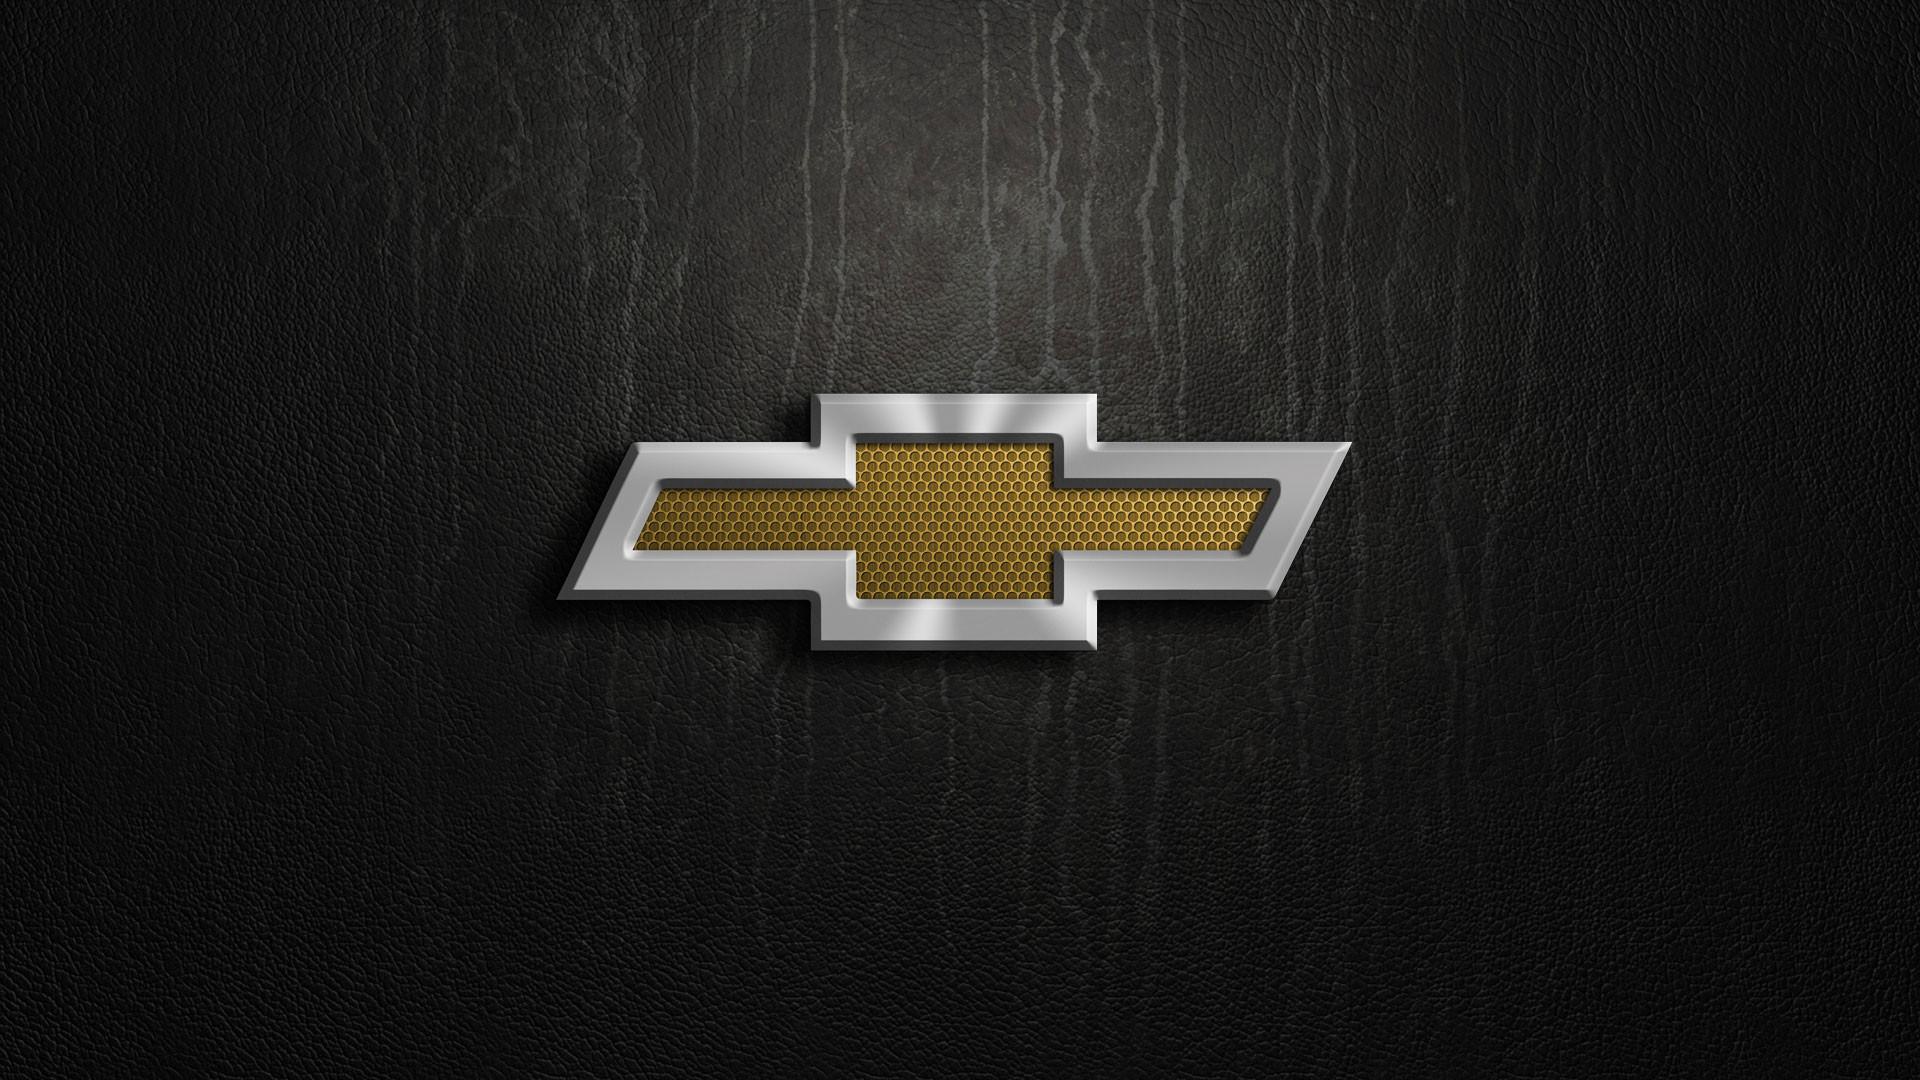 Res: 1920x1080, Chevy Wallpaper Desktop